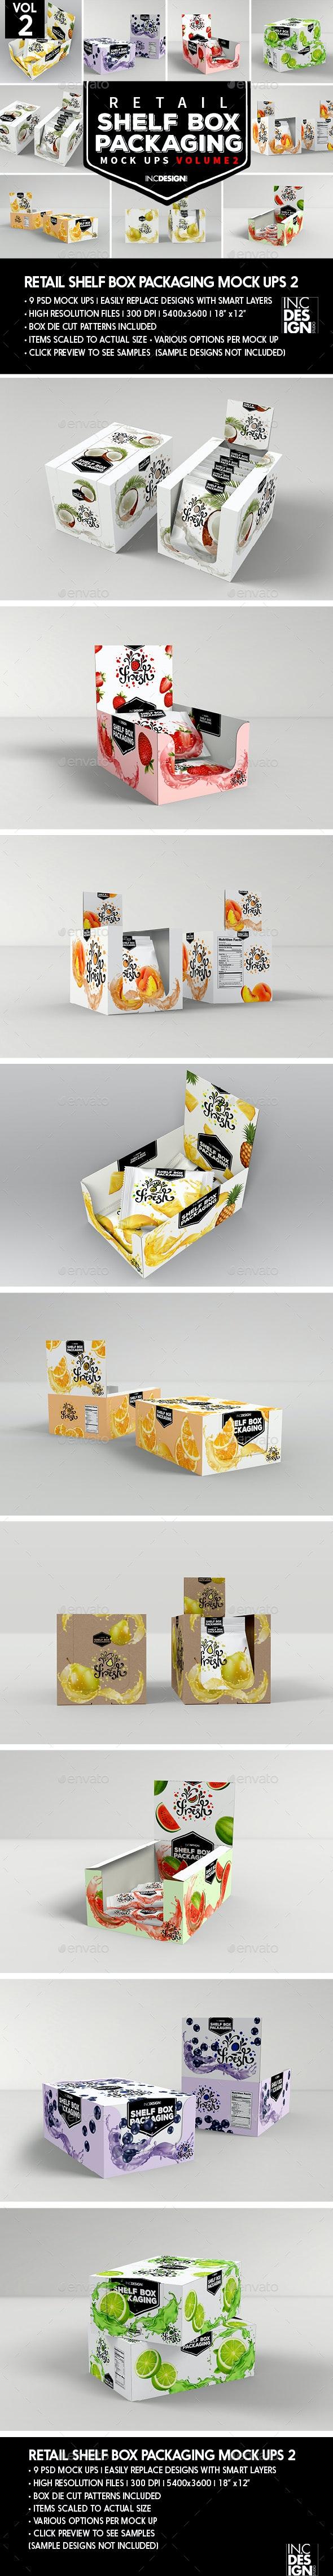 Retail Shelf Box Packaging Mockups 2 - Food and Drink Packaging